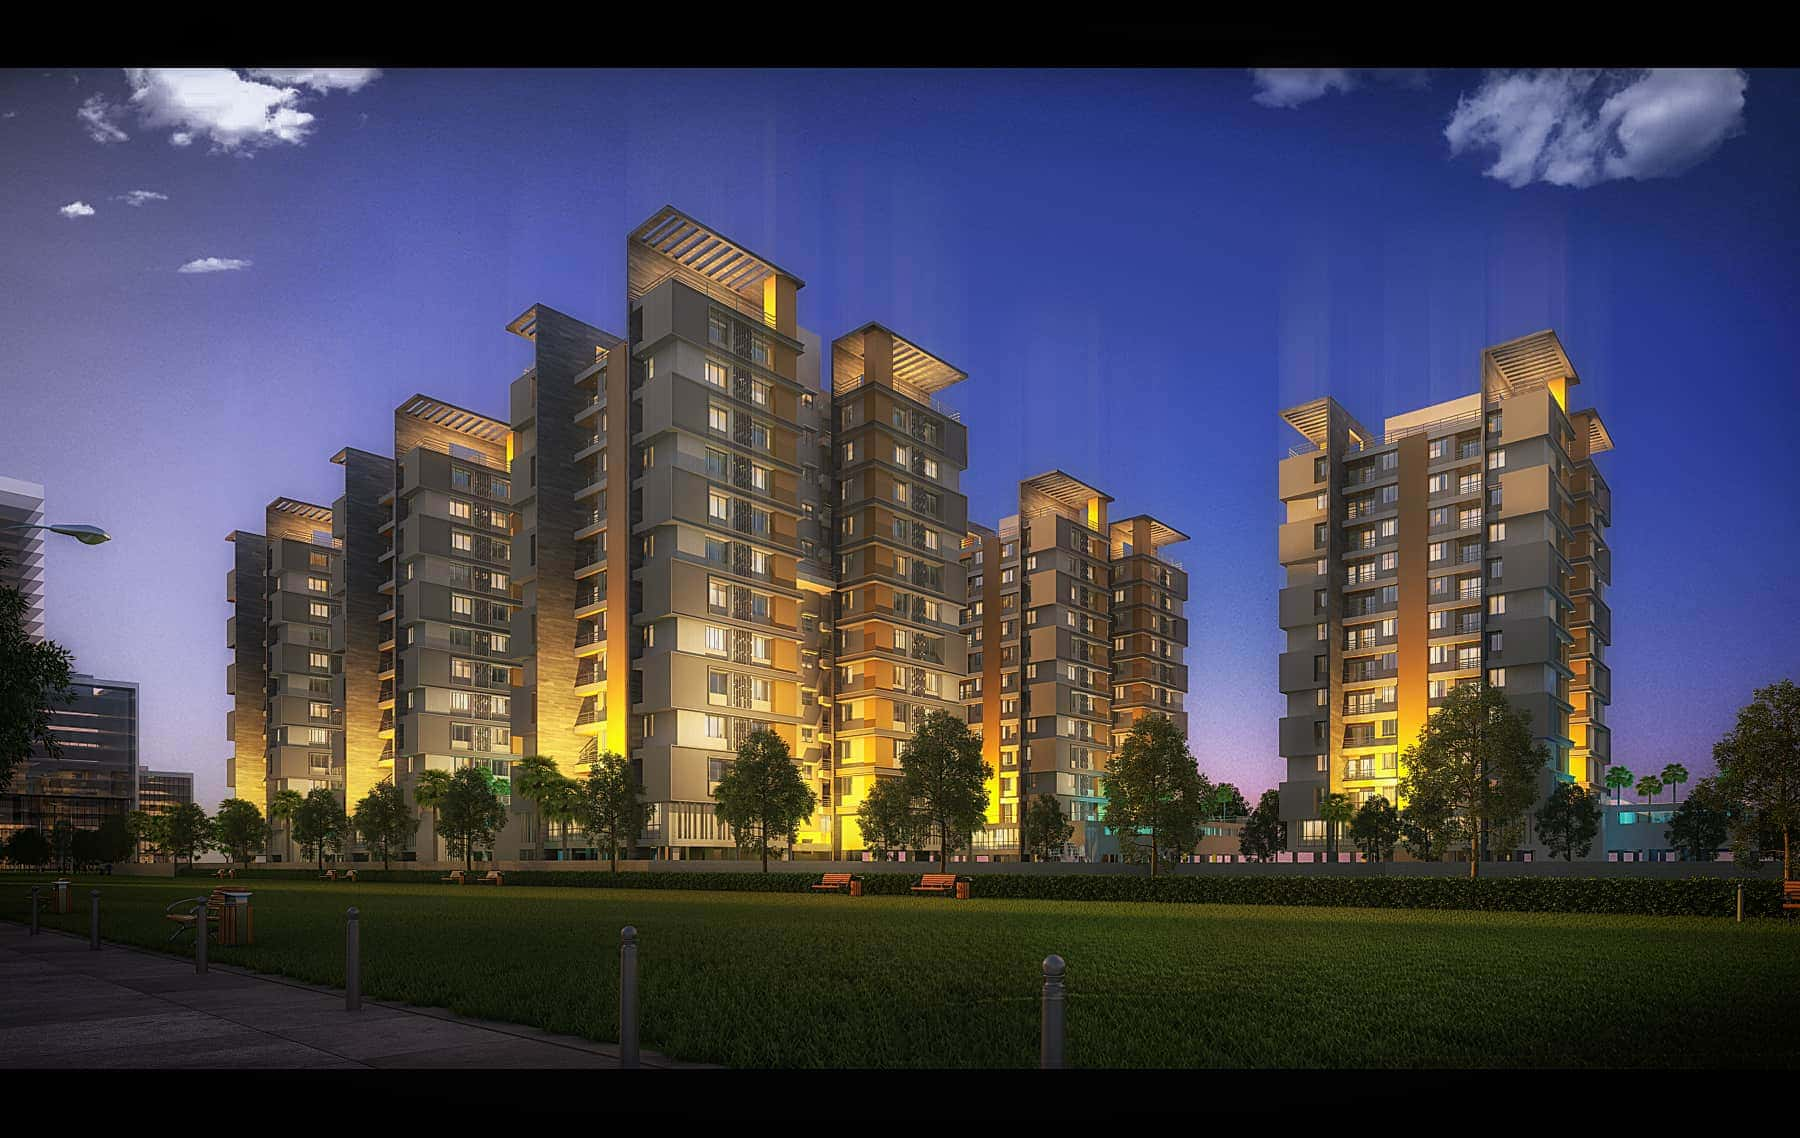 2 BHK & 3 BHK Flats for Sale in Rajarhat, Kolkata | Unimark Merlion